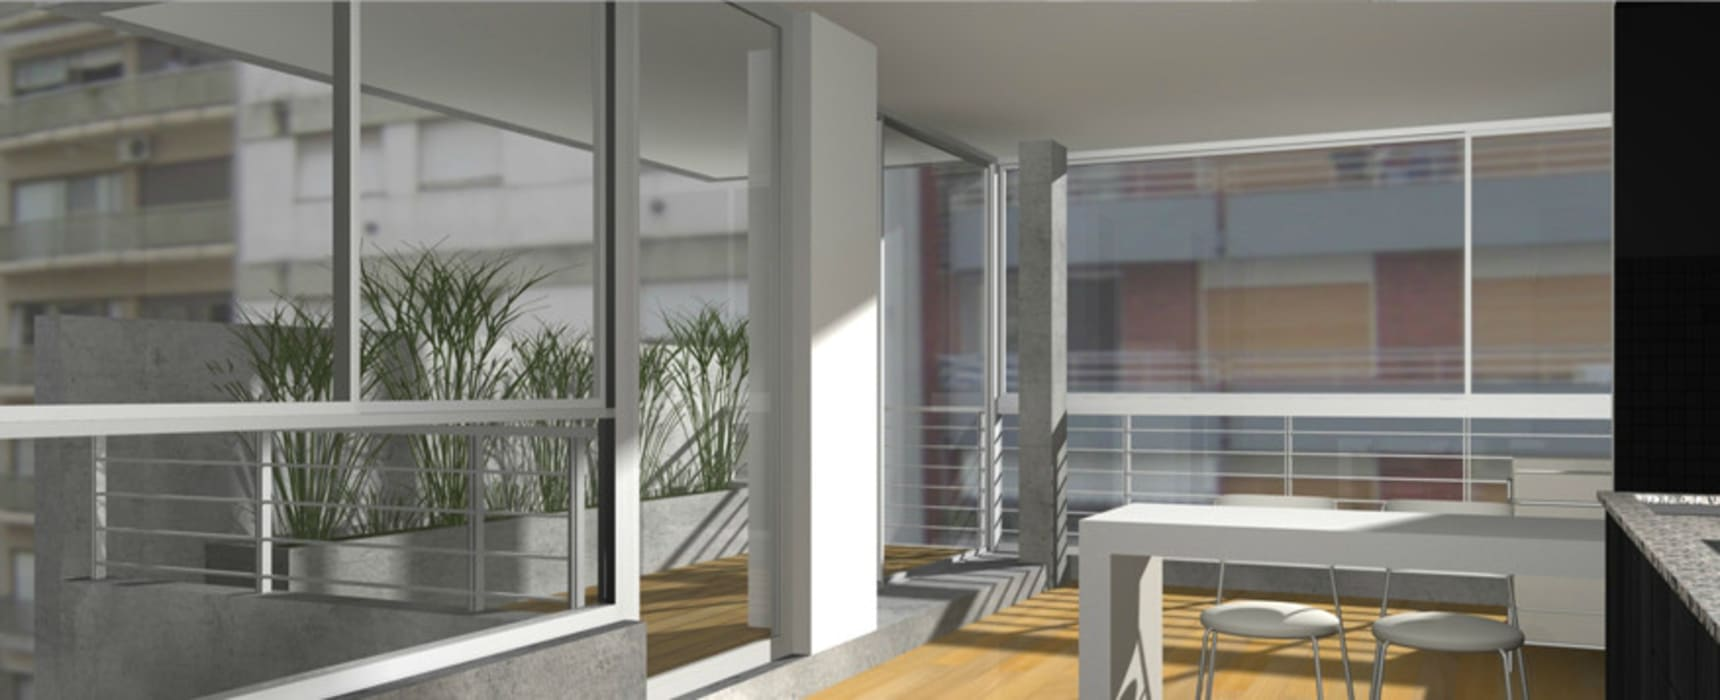 Maisons modernes par atlantico estudio de arquitectura y construccion Moderne Béton